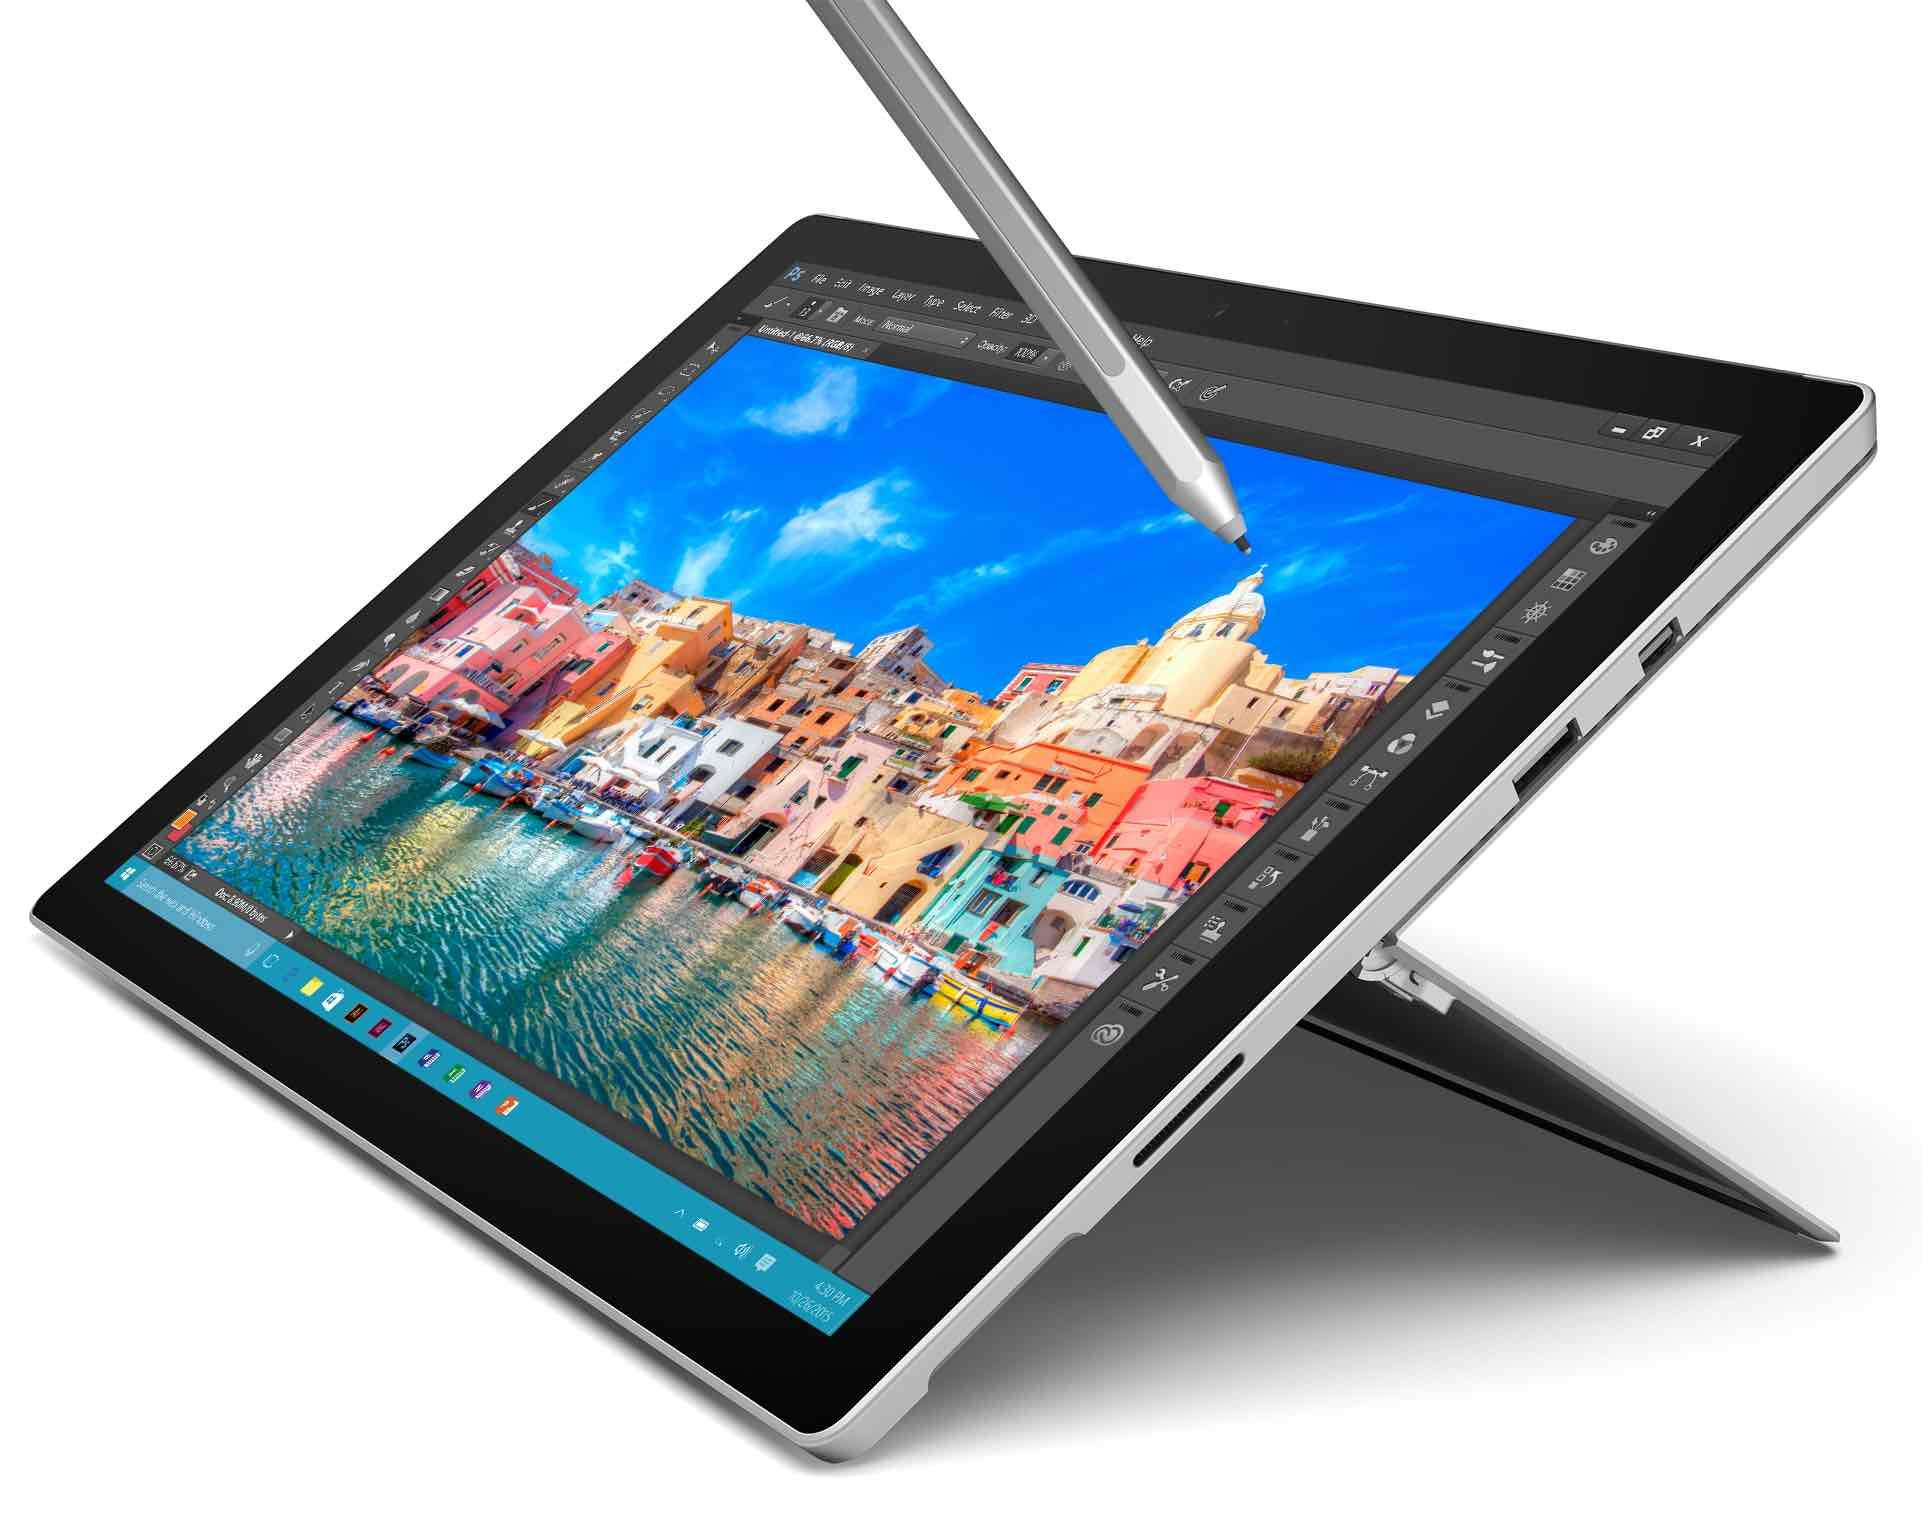 "[Abgelaufen] Microsoft Surface Pro 4, 256GB SSD inkl. Type Cover und Sleeve (12.30"", Intel Core i5-6300U, 8GB, SSD)"